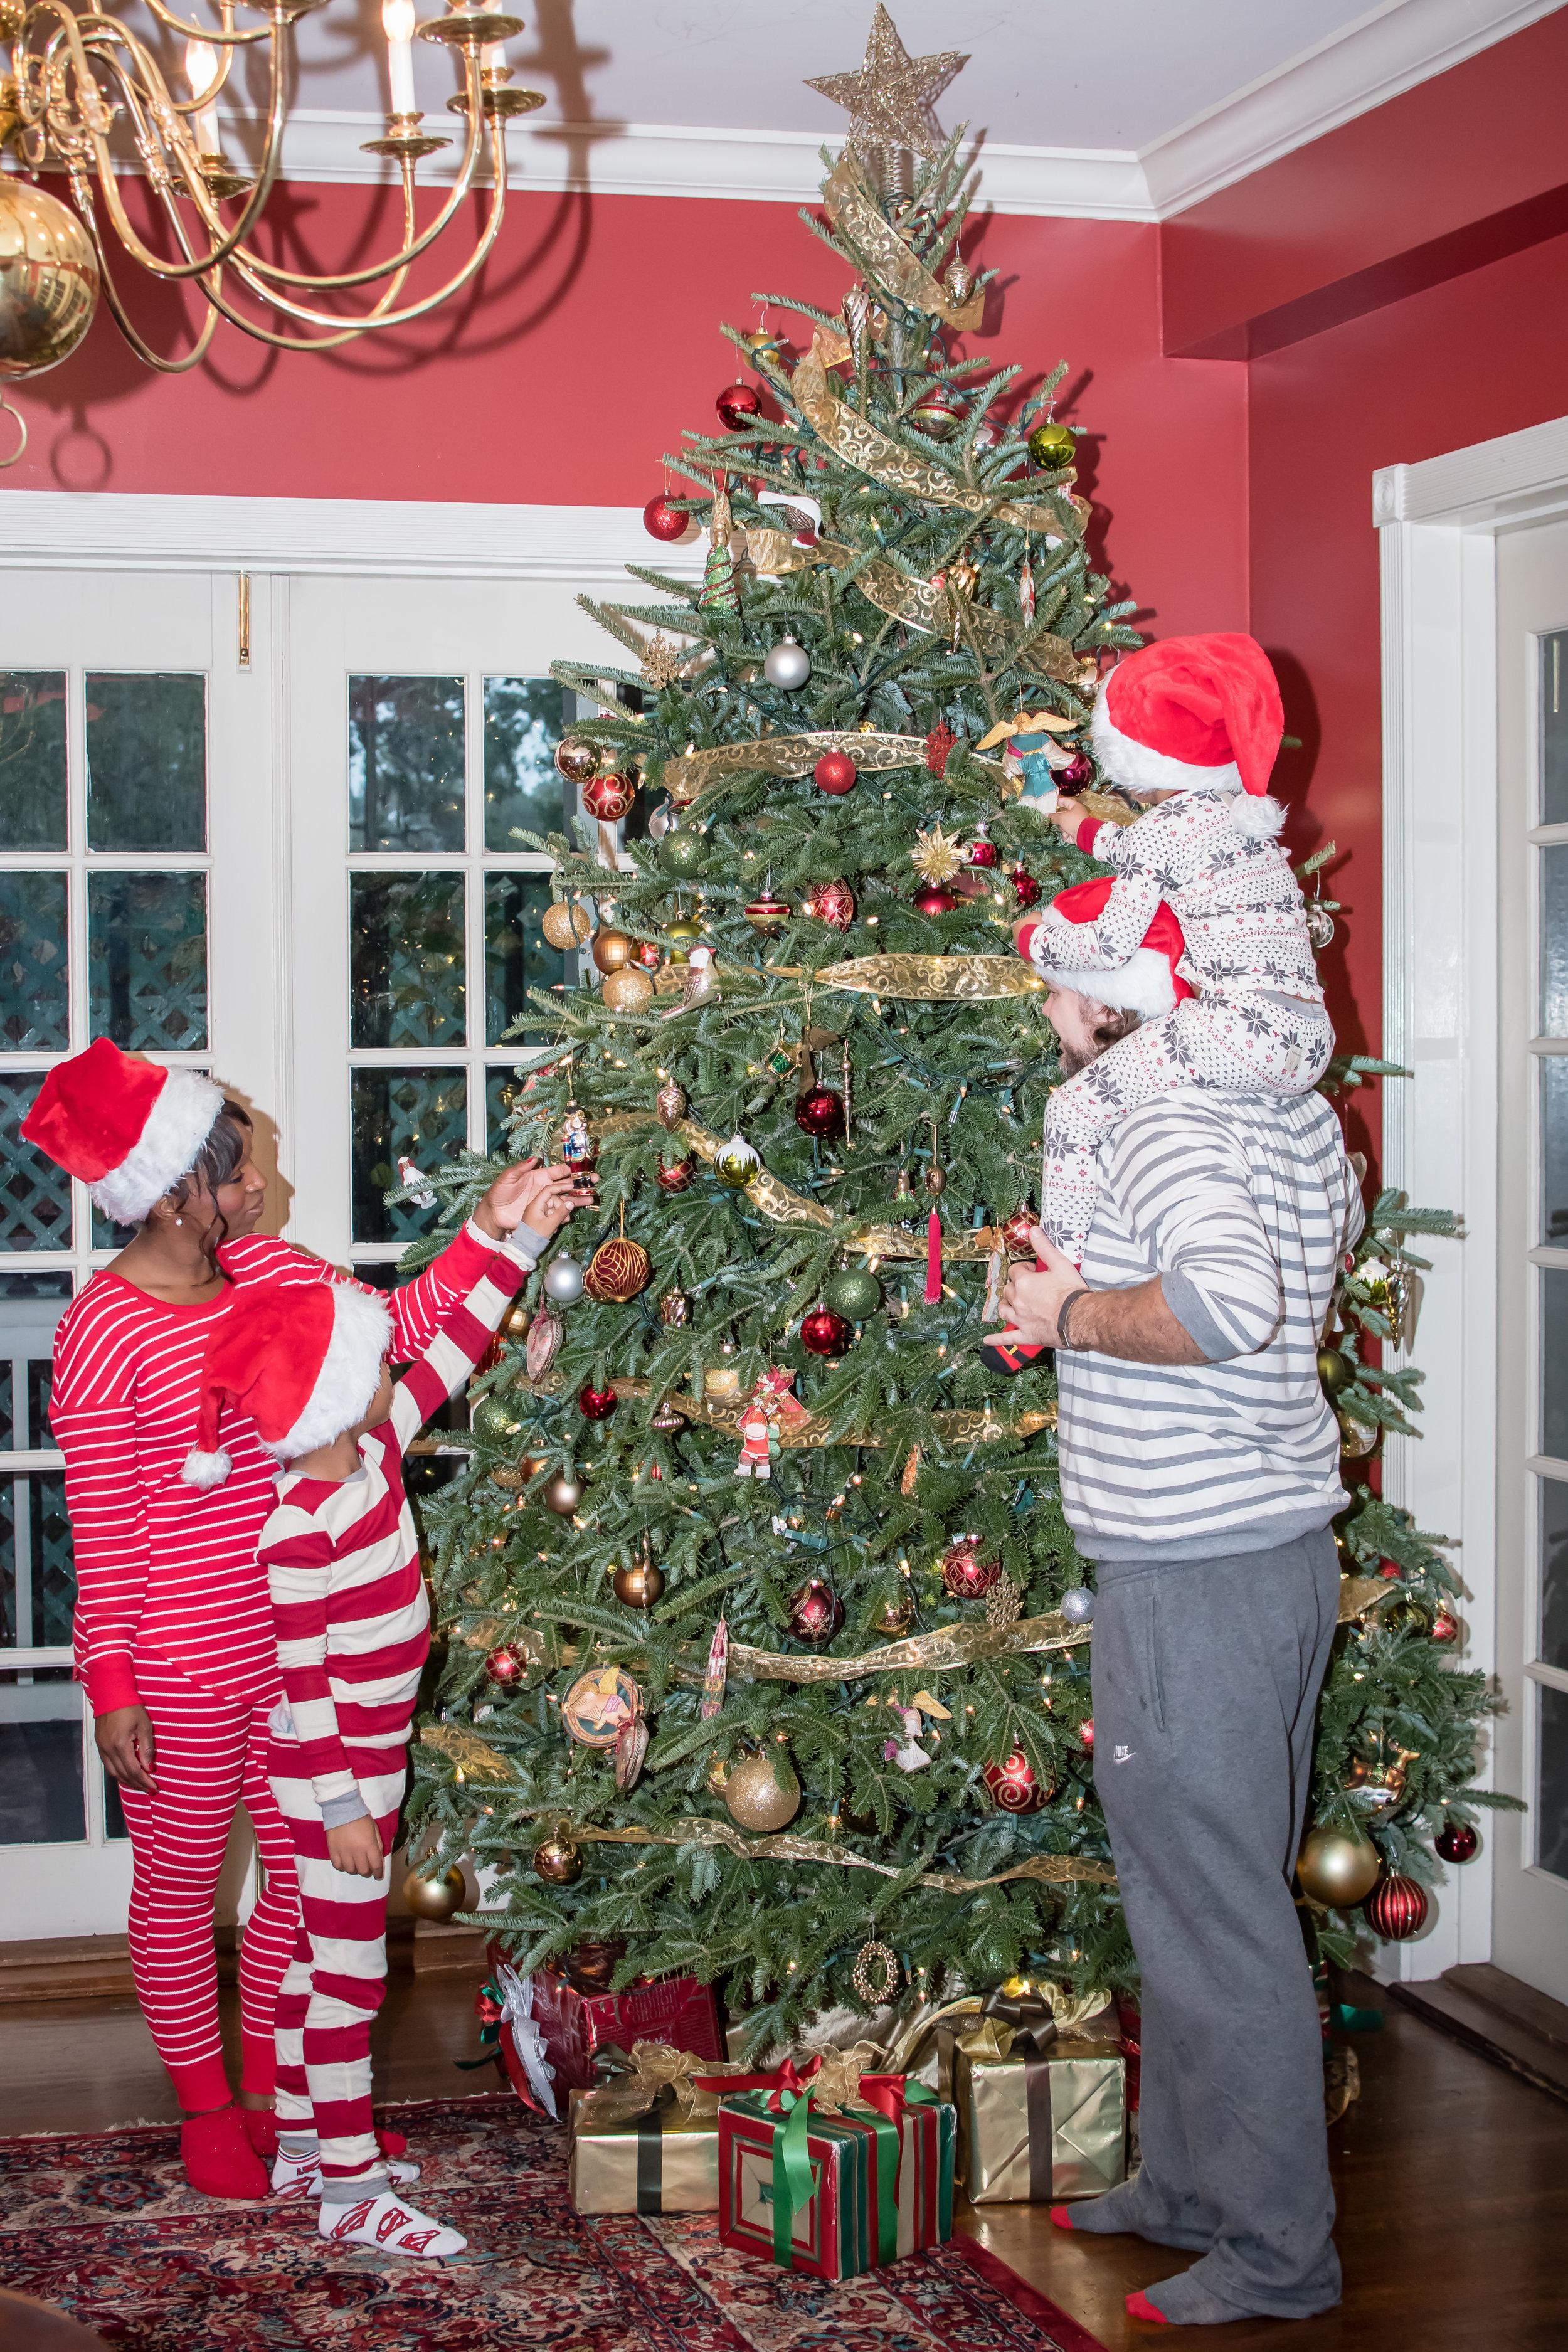 Christmas Day in pajamas photos by the tree Orlando Photographer Yanitza Ninett